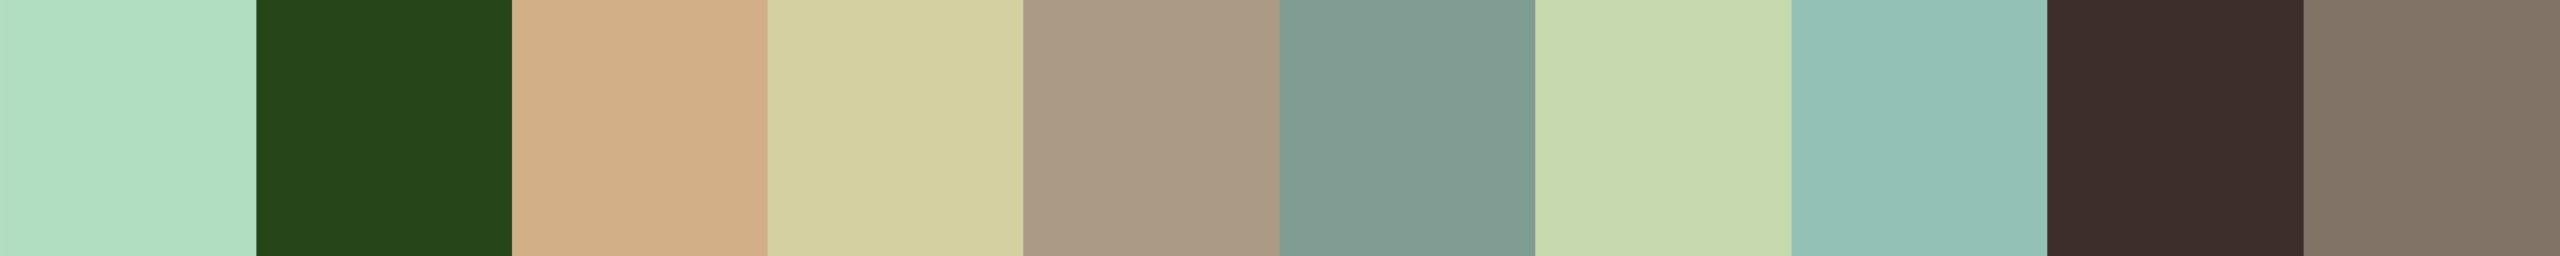 441 Forabodia Color Palette